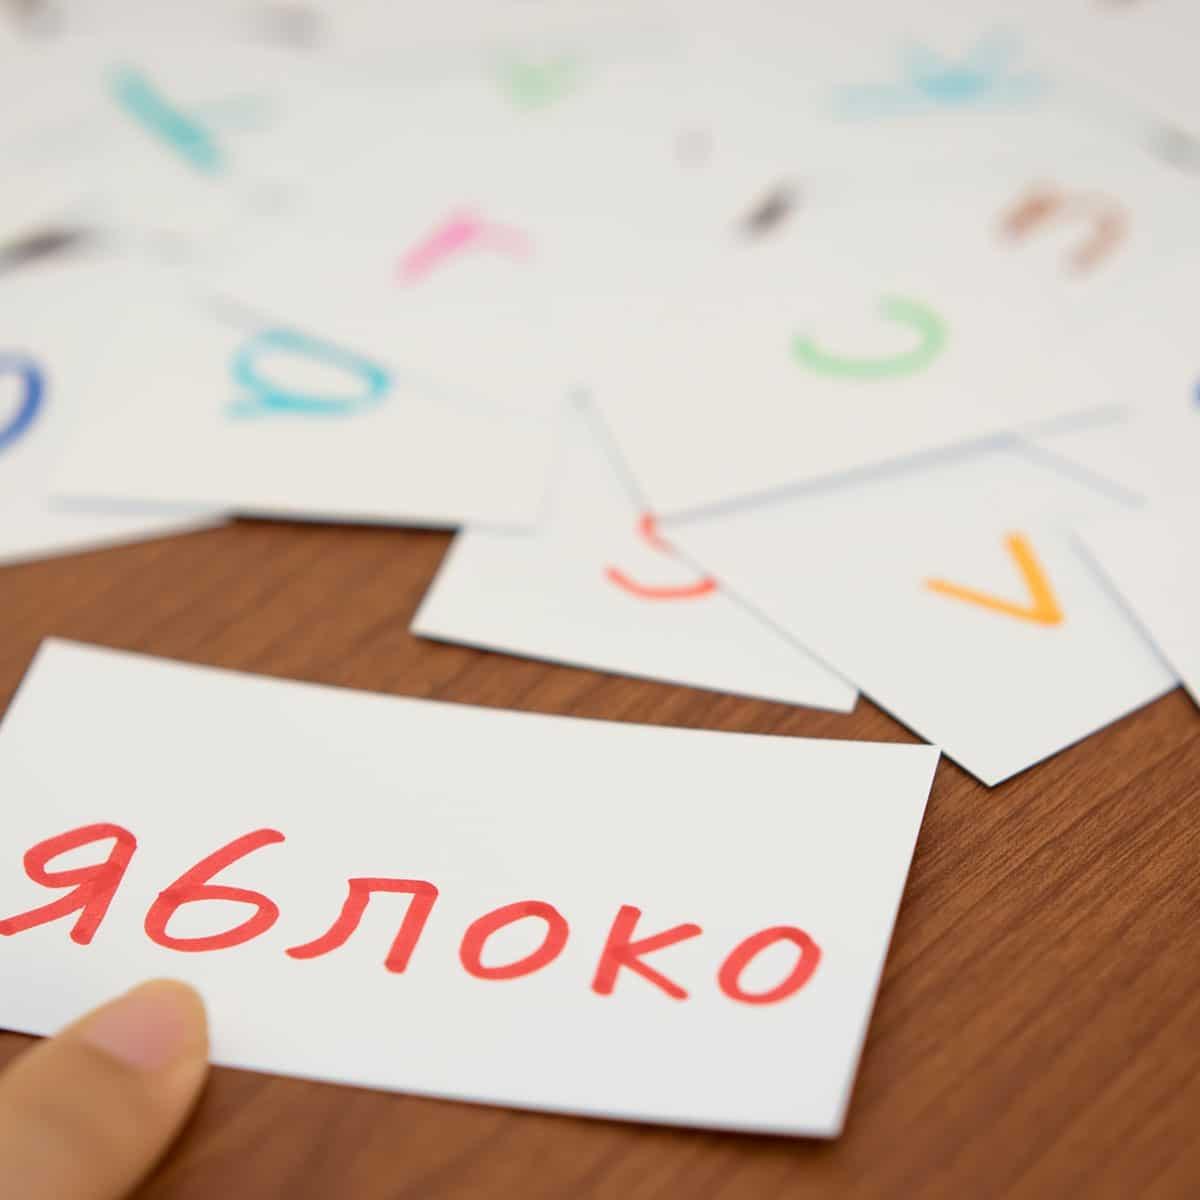 Russian Language Day 2019